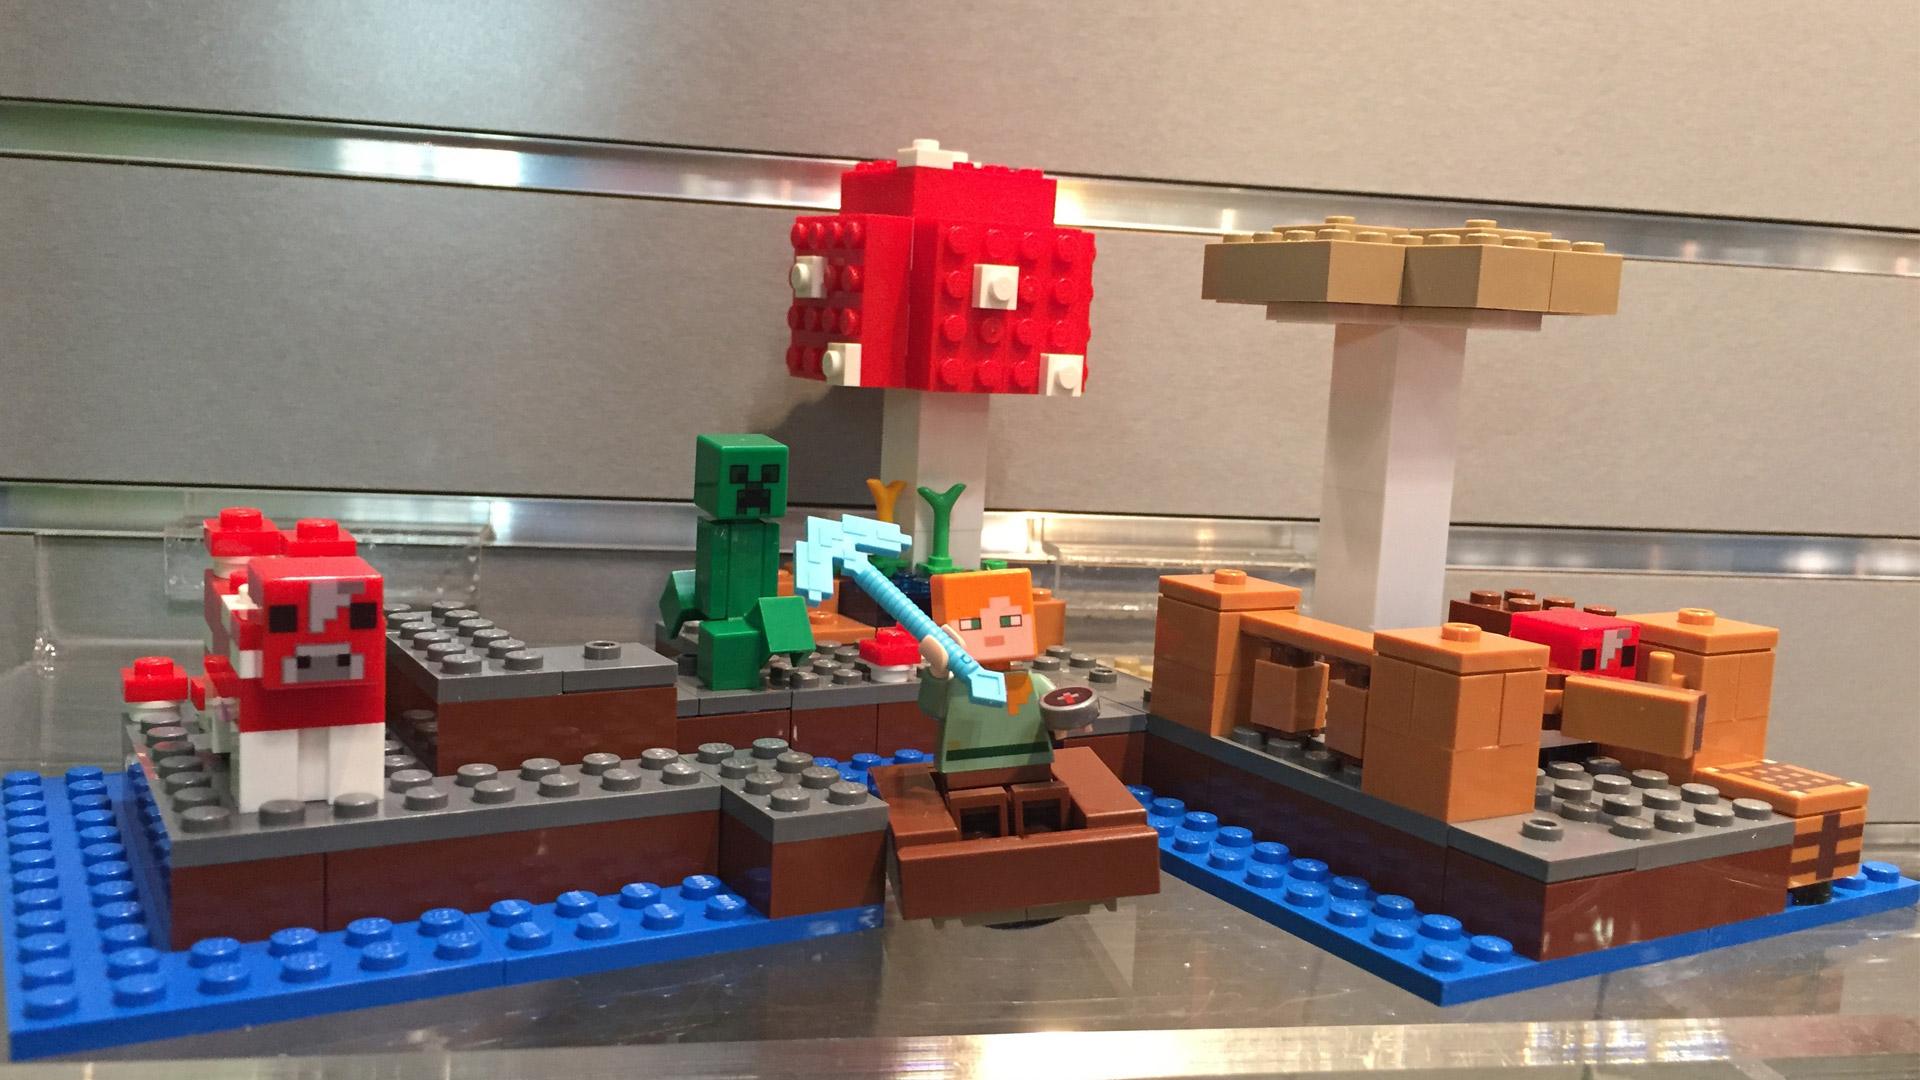 LEGO Minecraft Set 21129 Mushroom Island at Toy Fair 2017